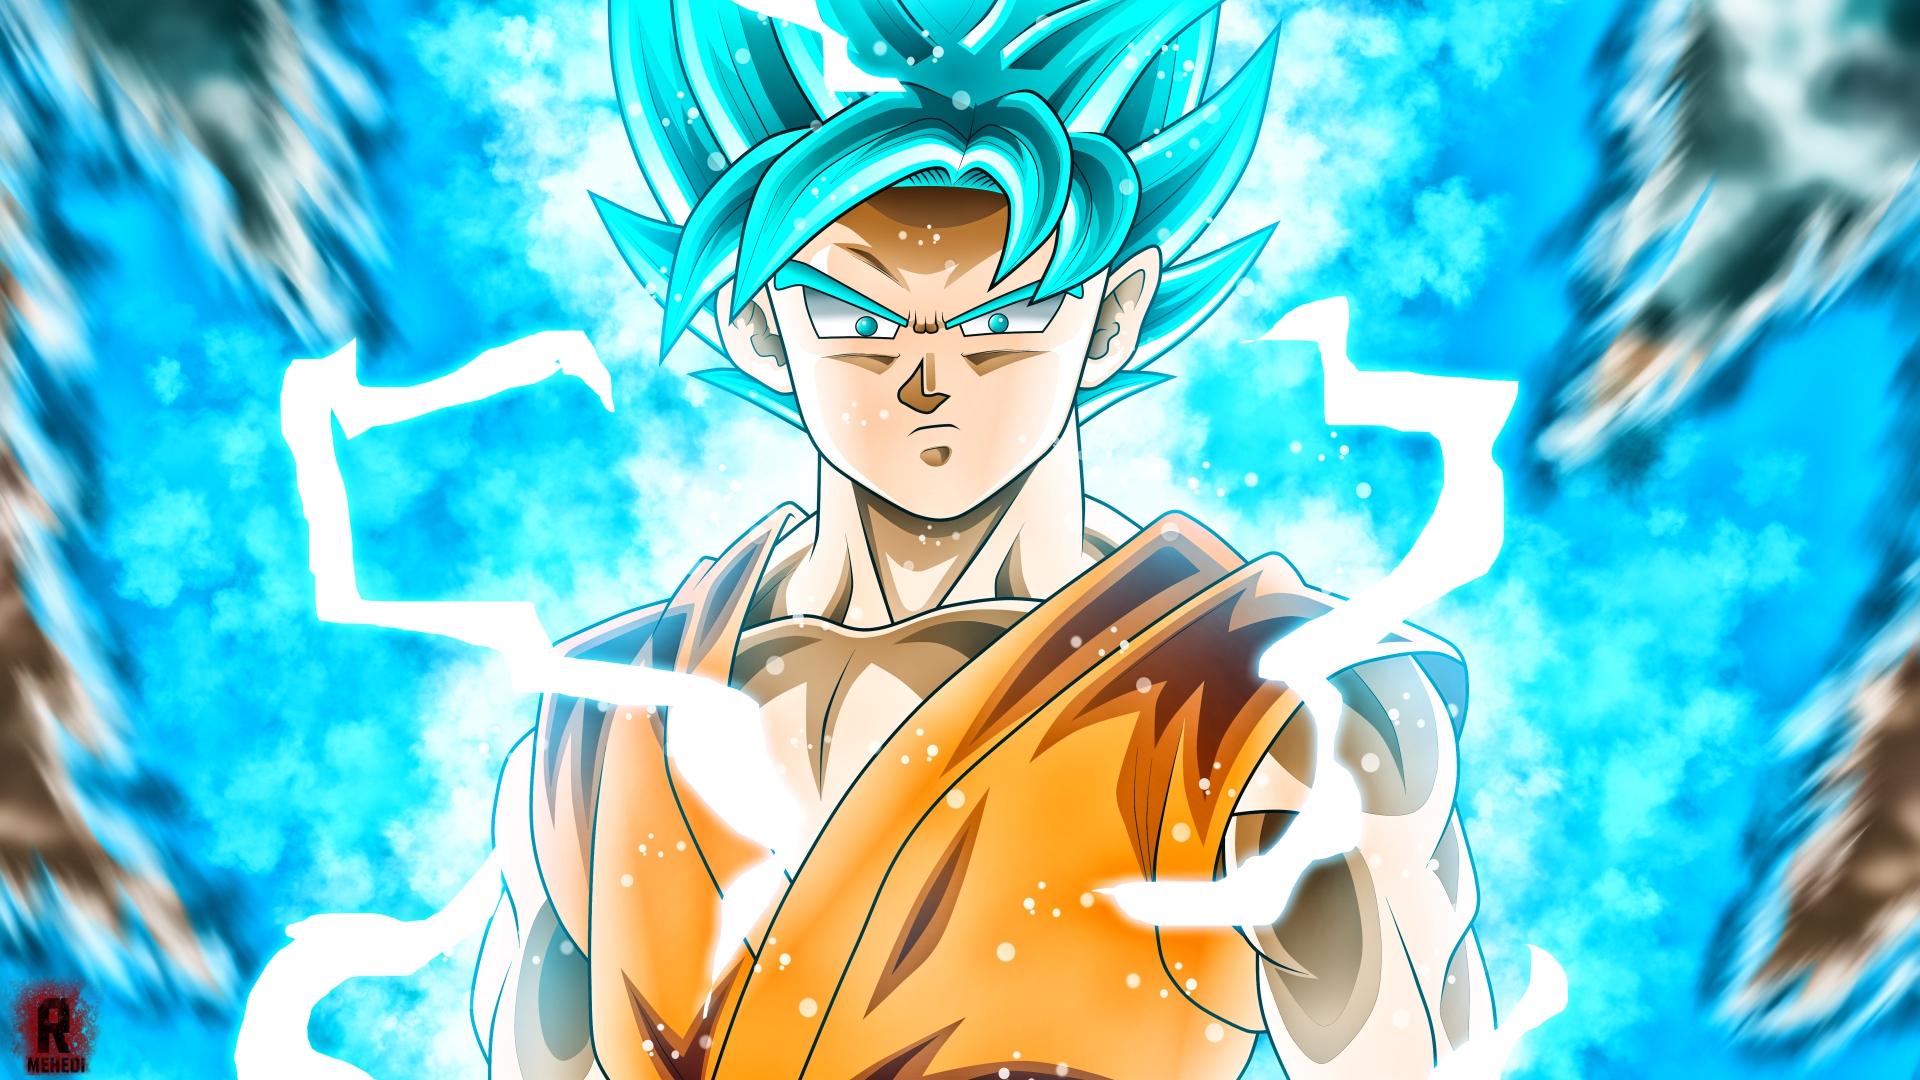 Title Super Saiyan Blue Goku Wallpapers Wallpaper Cave Dimension 1920 X 1080 File Type JPG JPEG